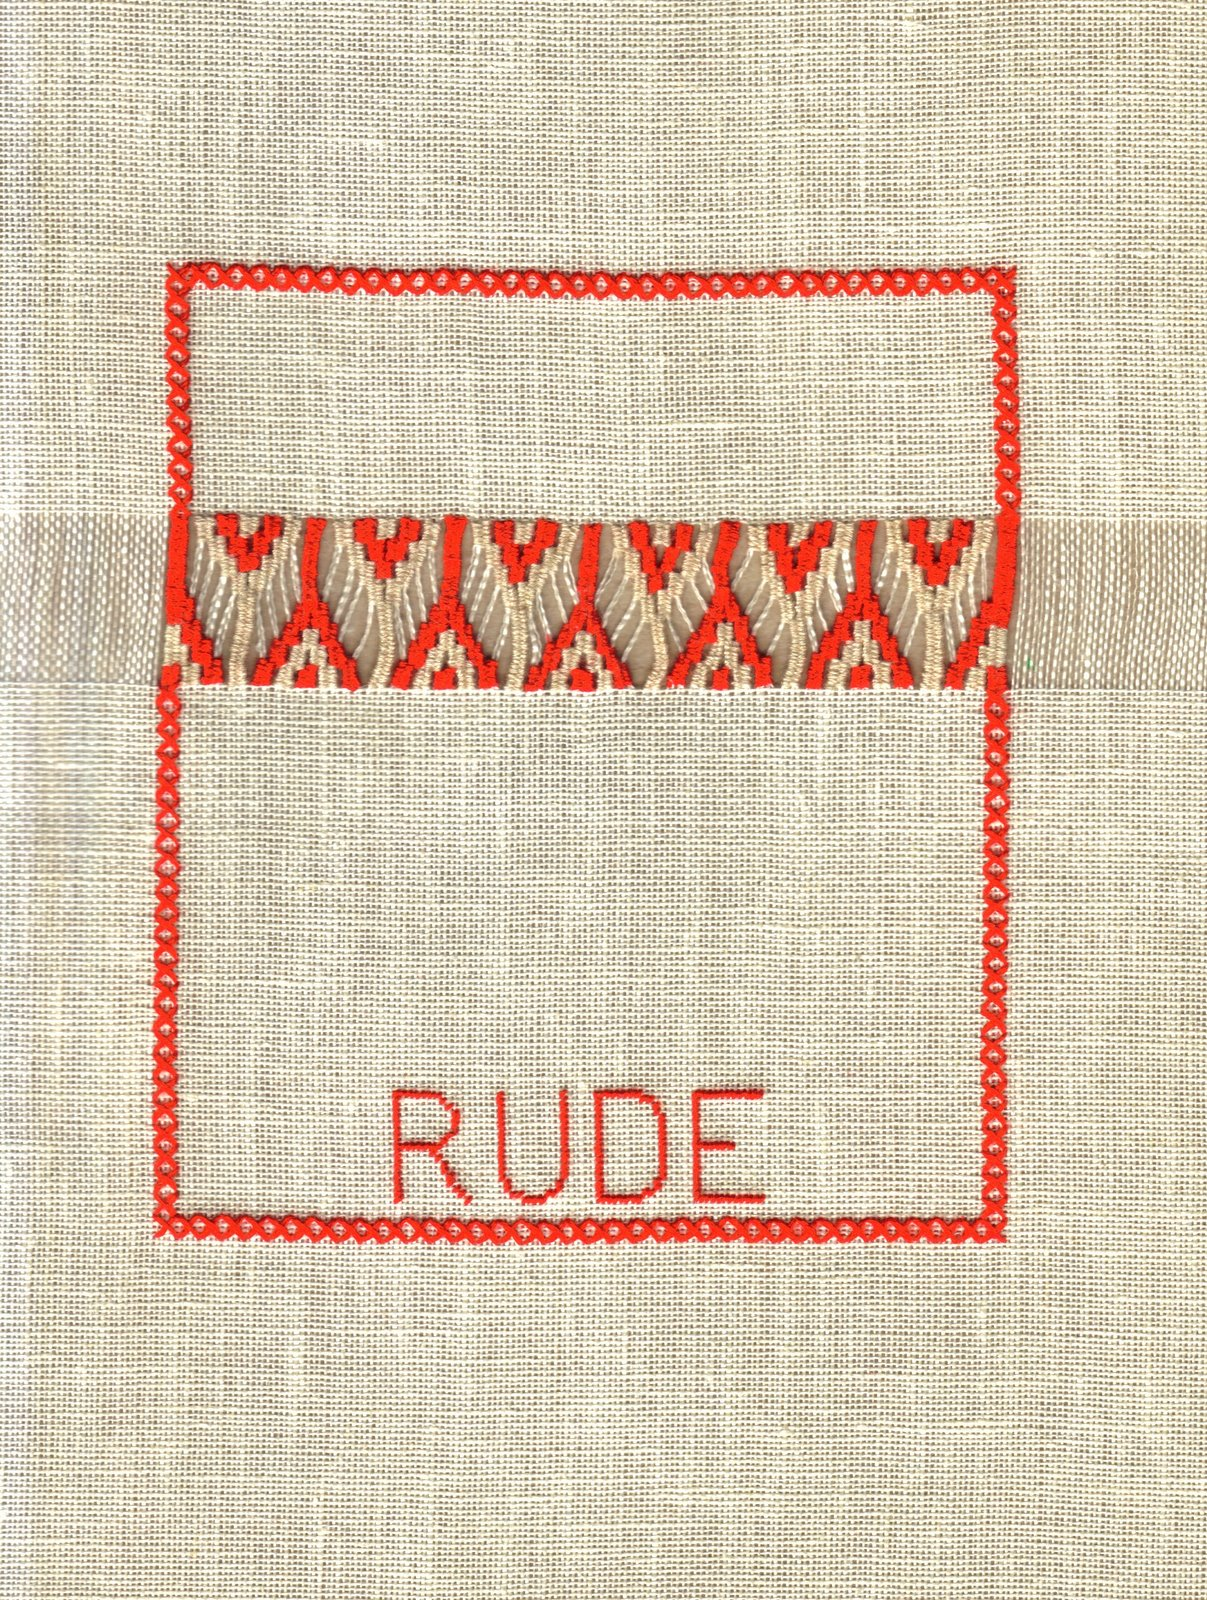 Rude (2006)